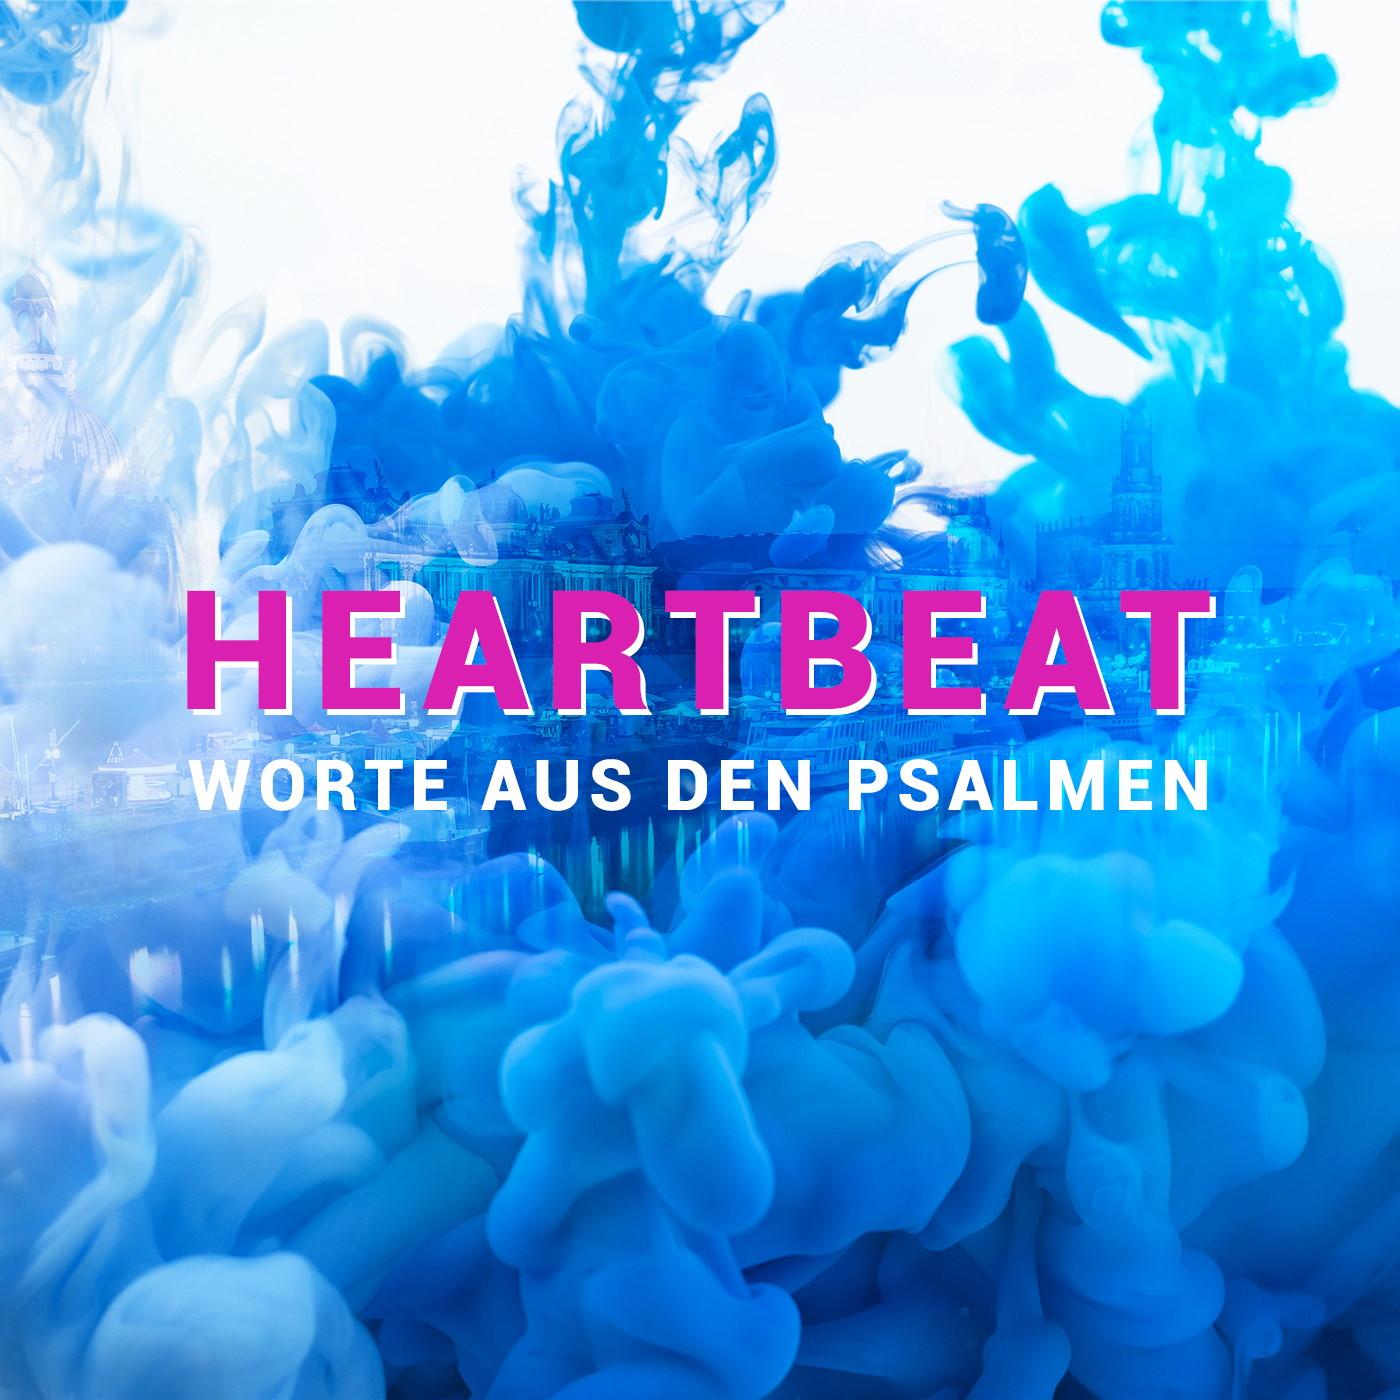 Heartbeat - Worte aus den Psalmen Teil 2 [video]